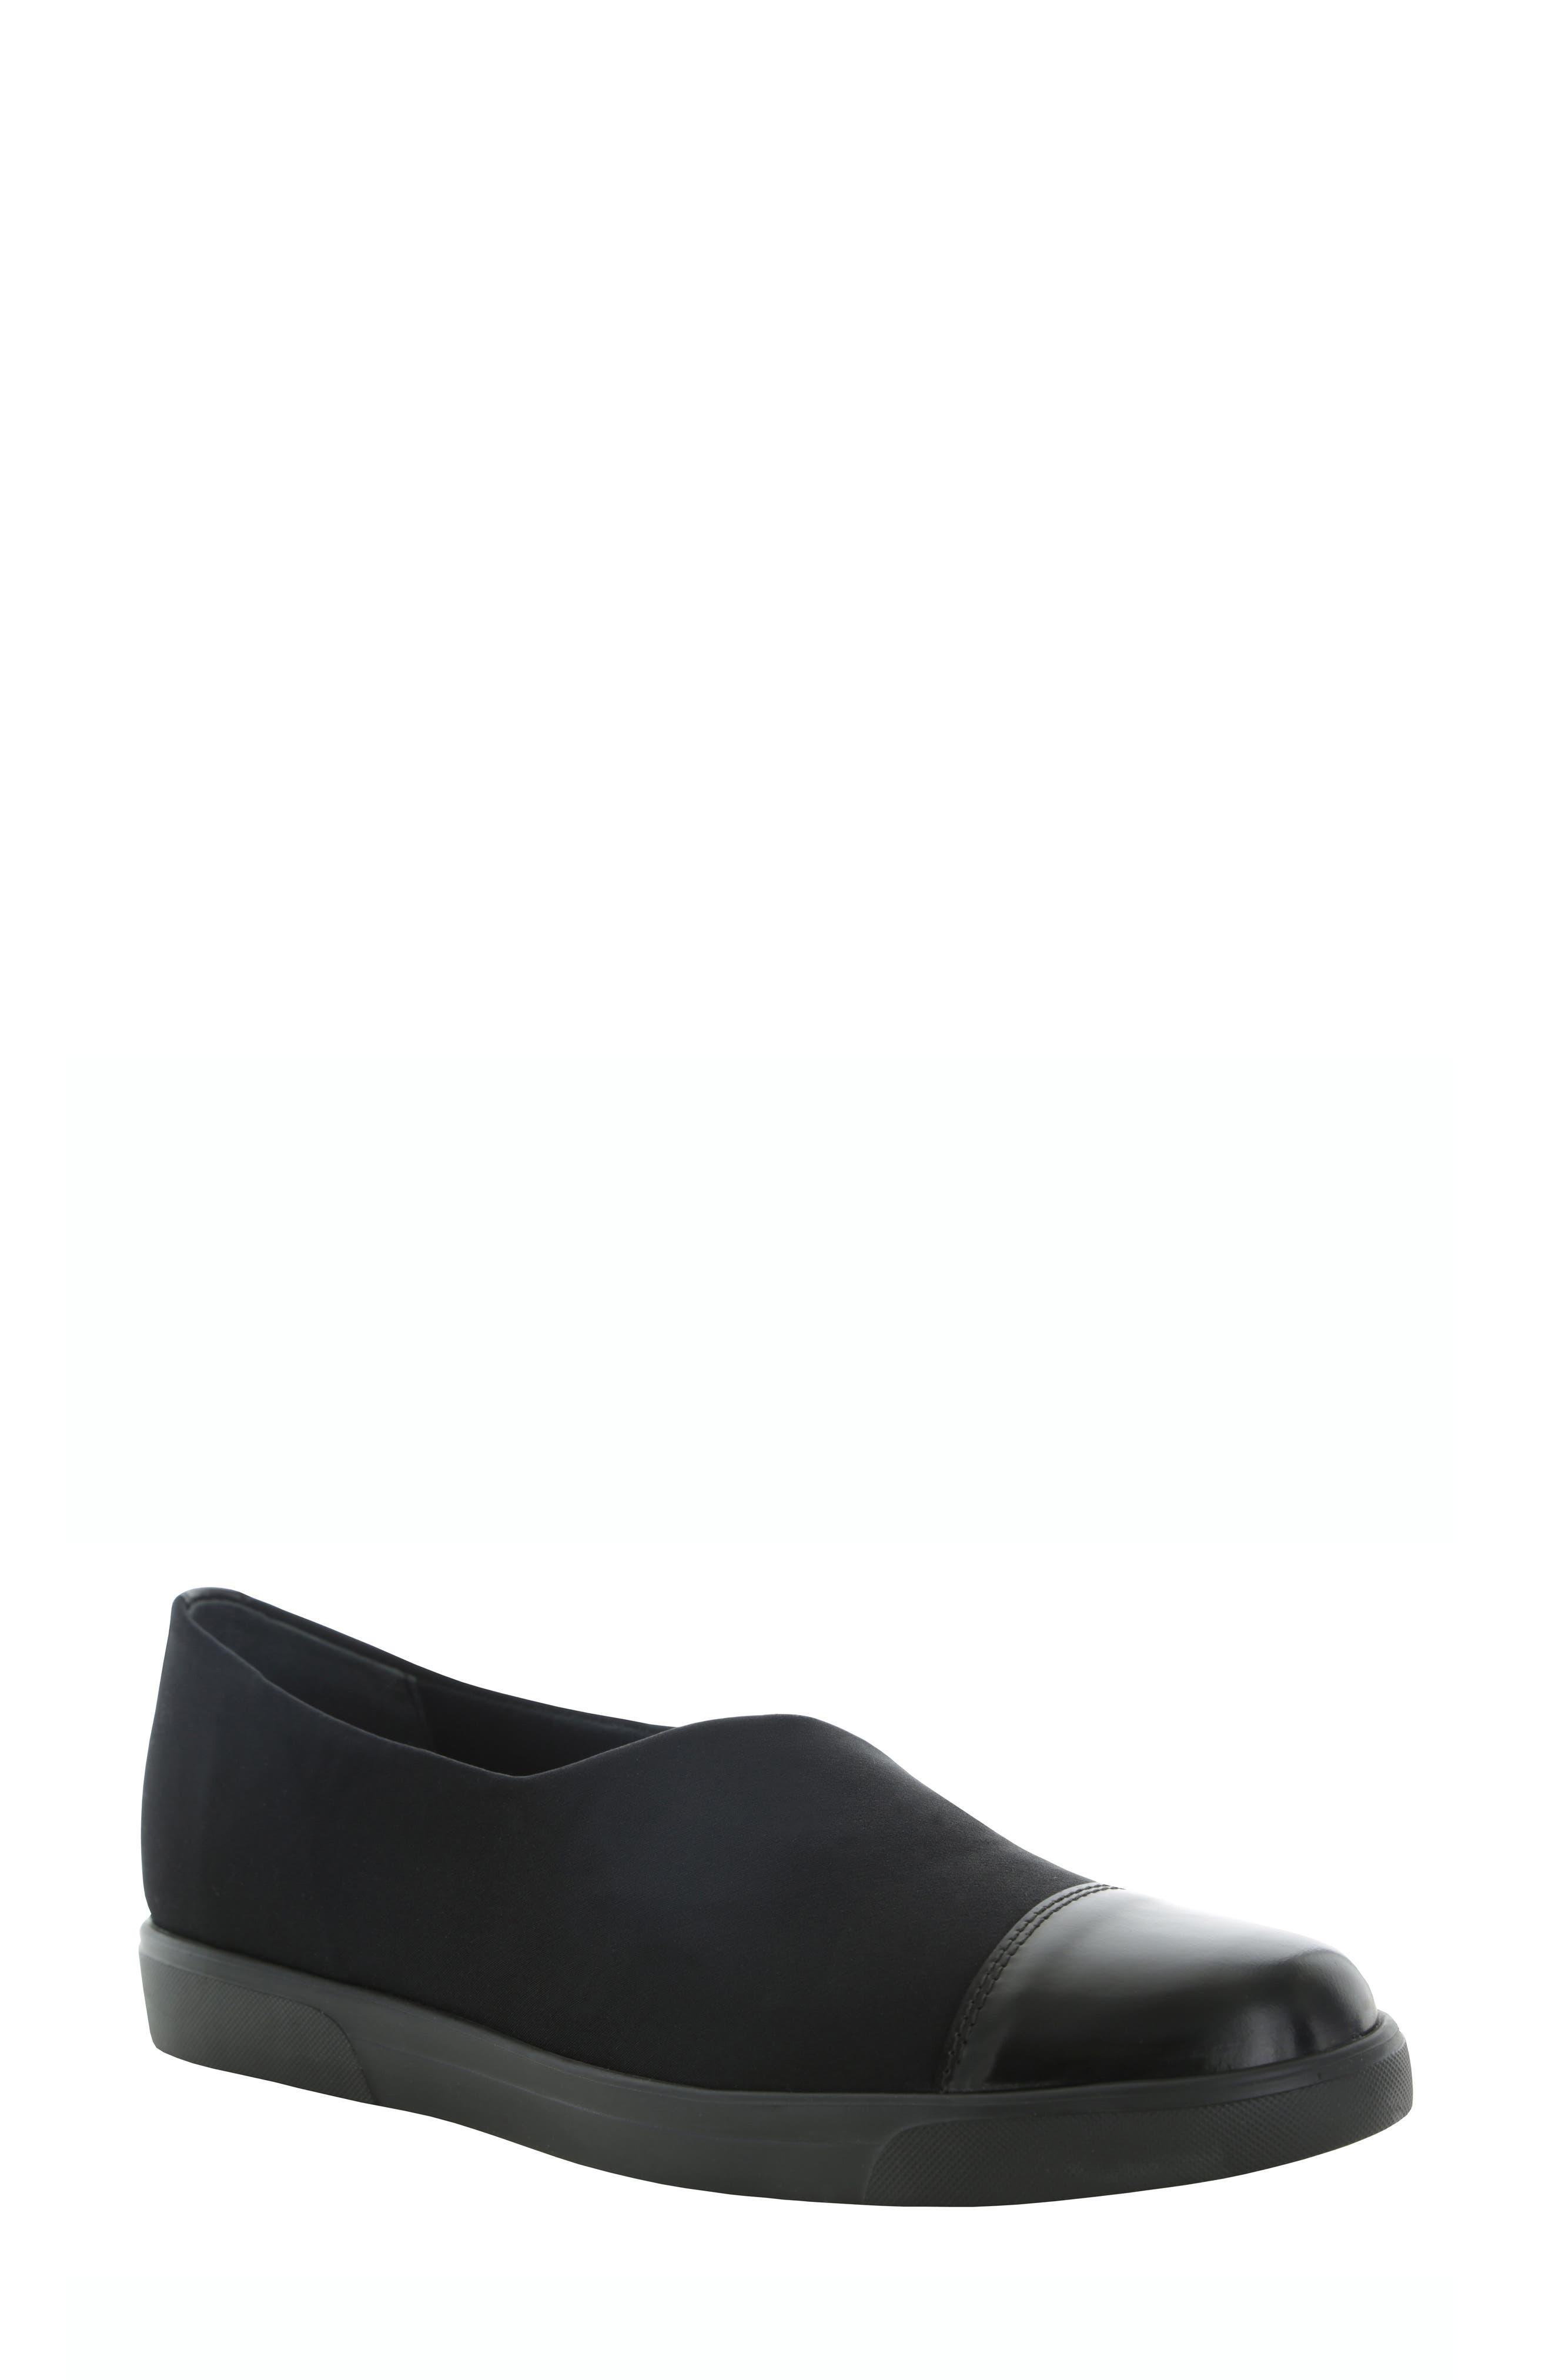 MUNRO Plum Slip-On Flat, Main, color, BLACK STRETCH FABRIC